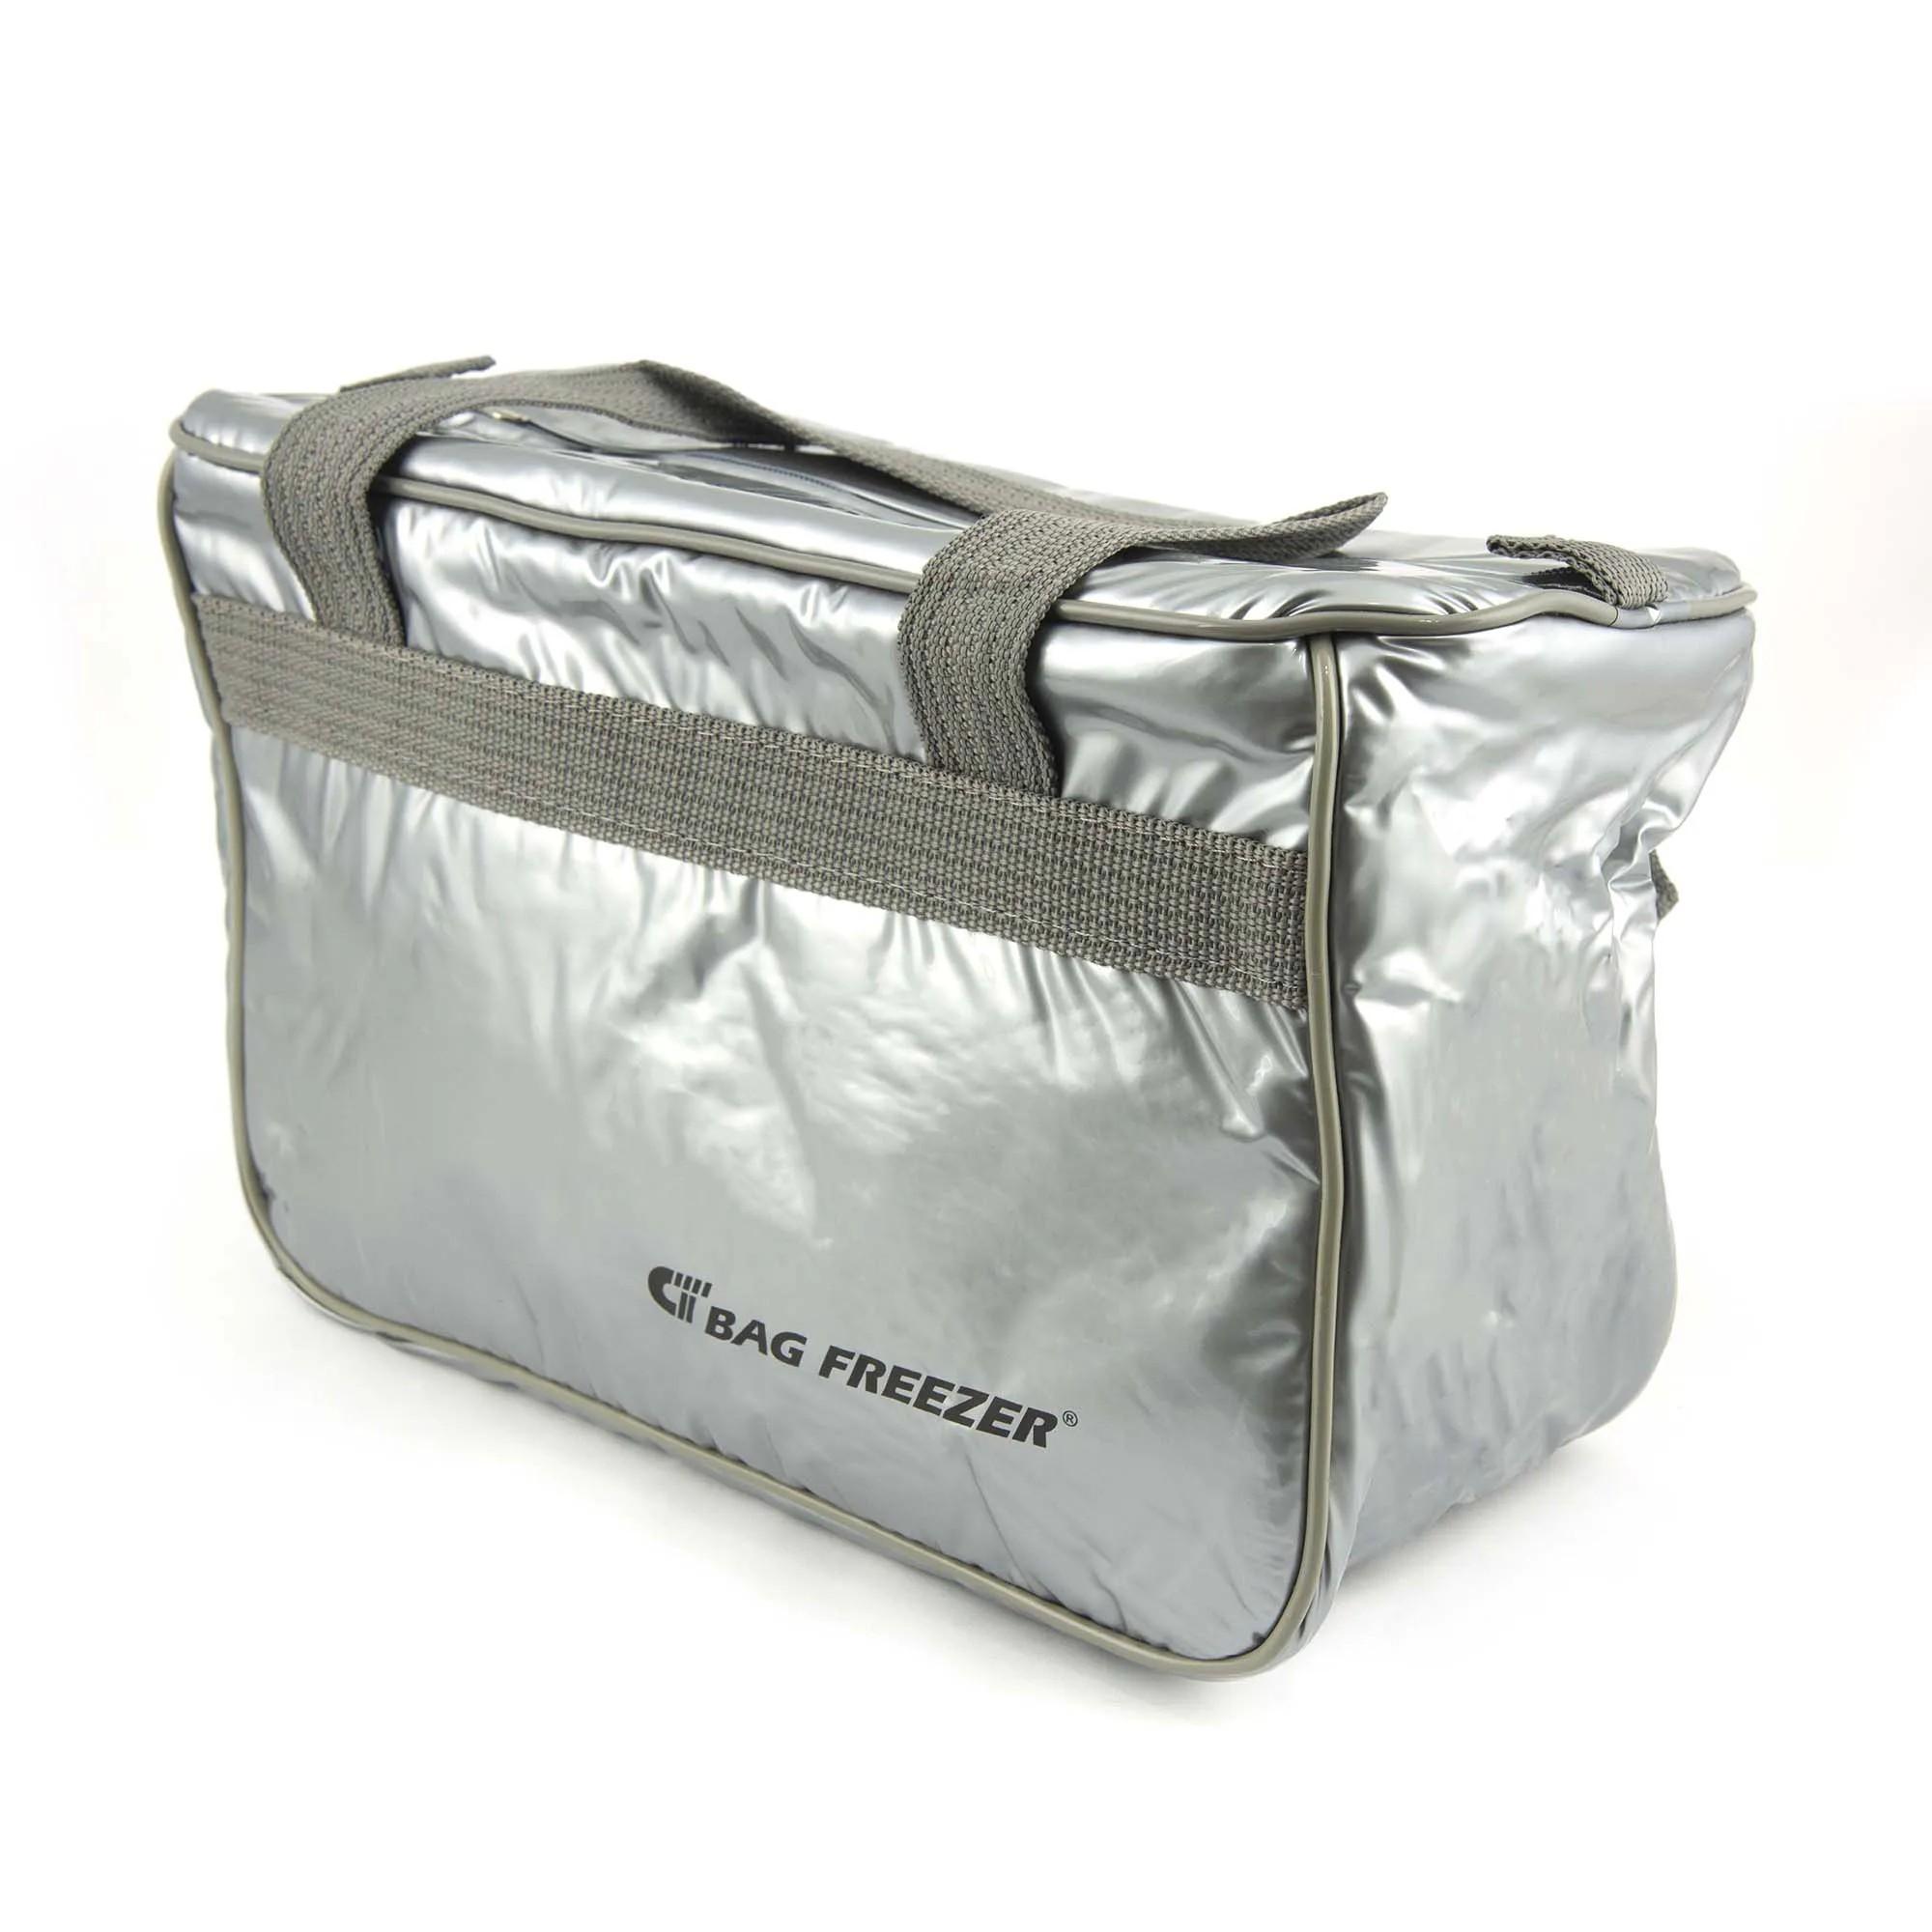 Bolsa Térmica Bag Freezer  - Artpesca